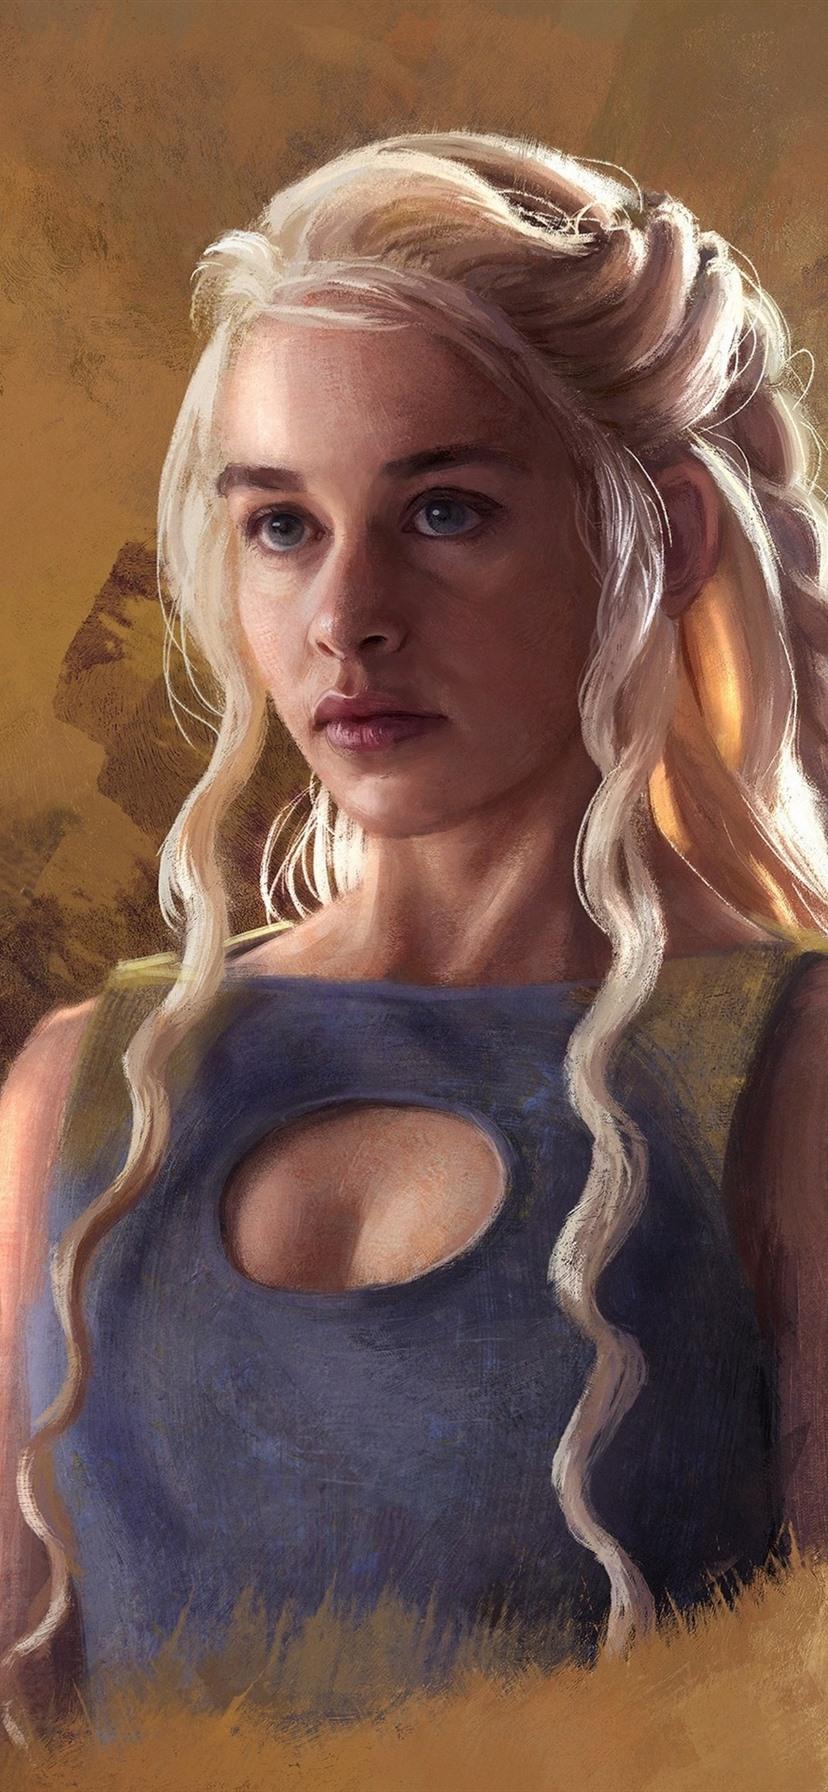 Wallpaper Queen Daenerys Game Of Thrones Art Picture 2880x1800